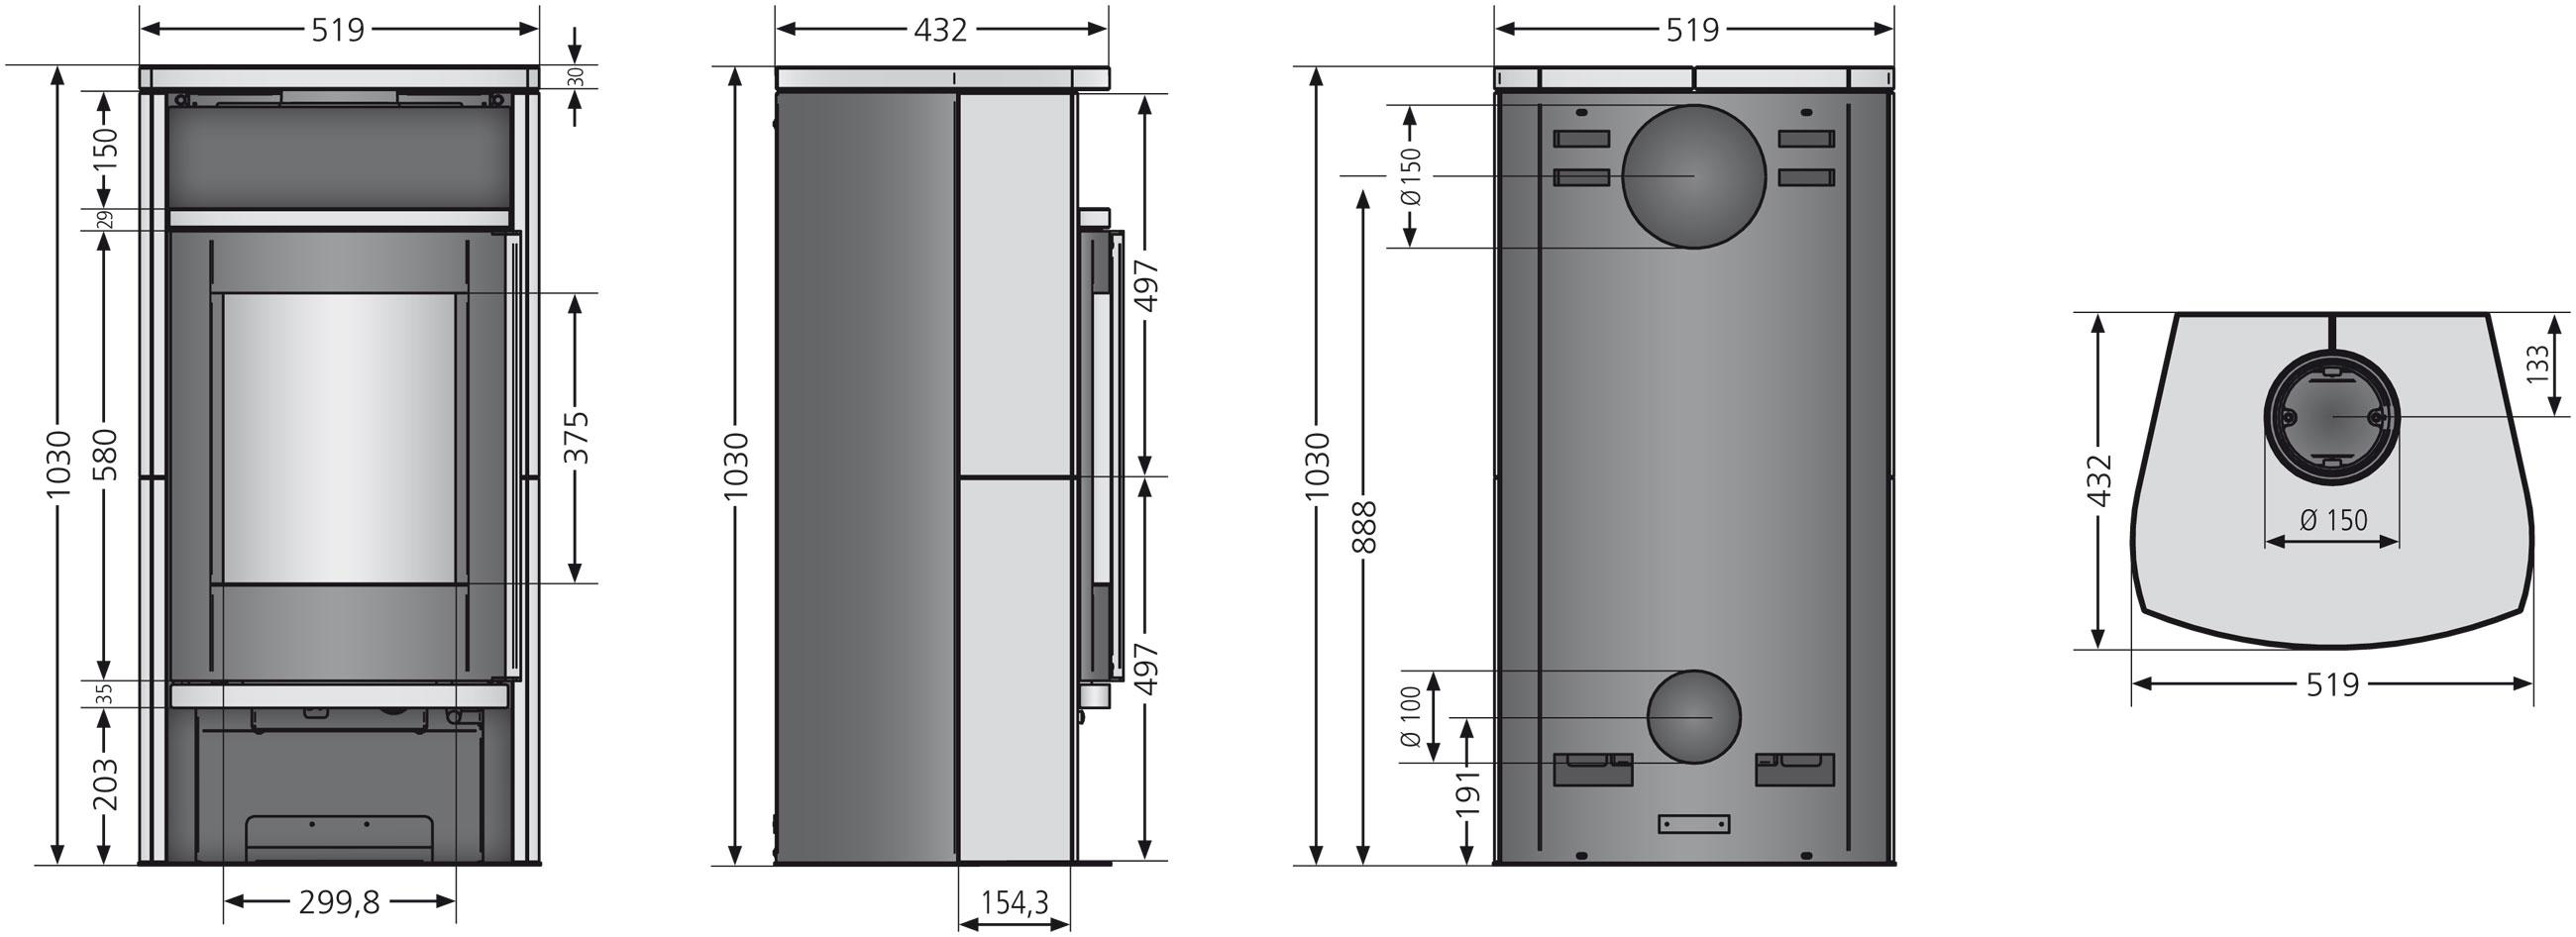 Kaminofen Dauerbrandofen Justus Frisco 2.0 raumluftunabh. Stahl 5kW Bild 2